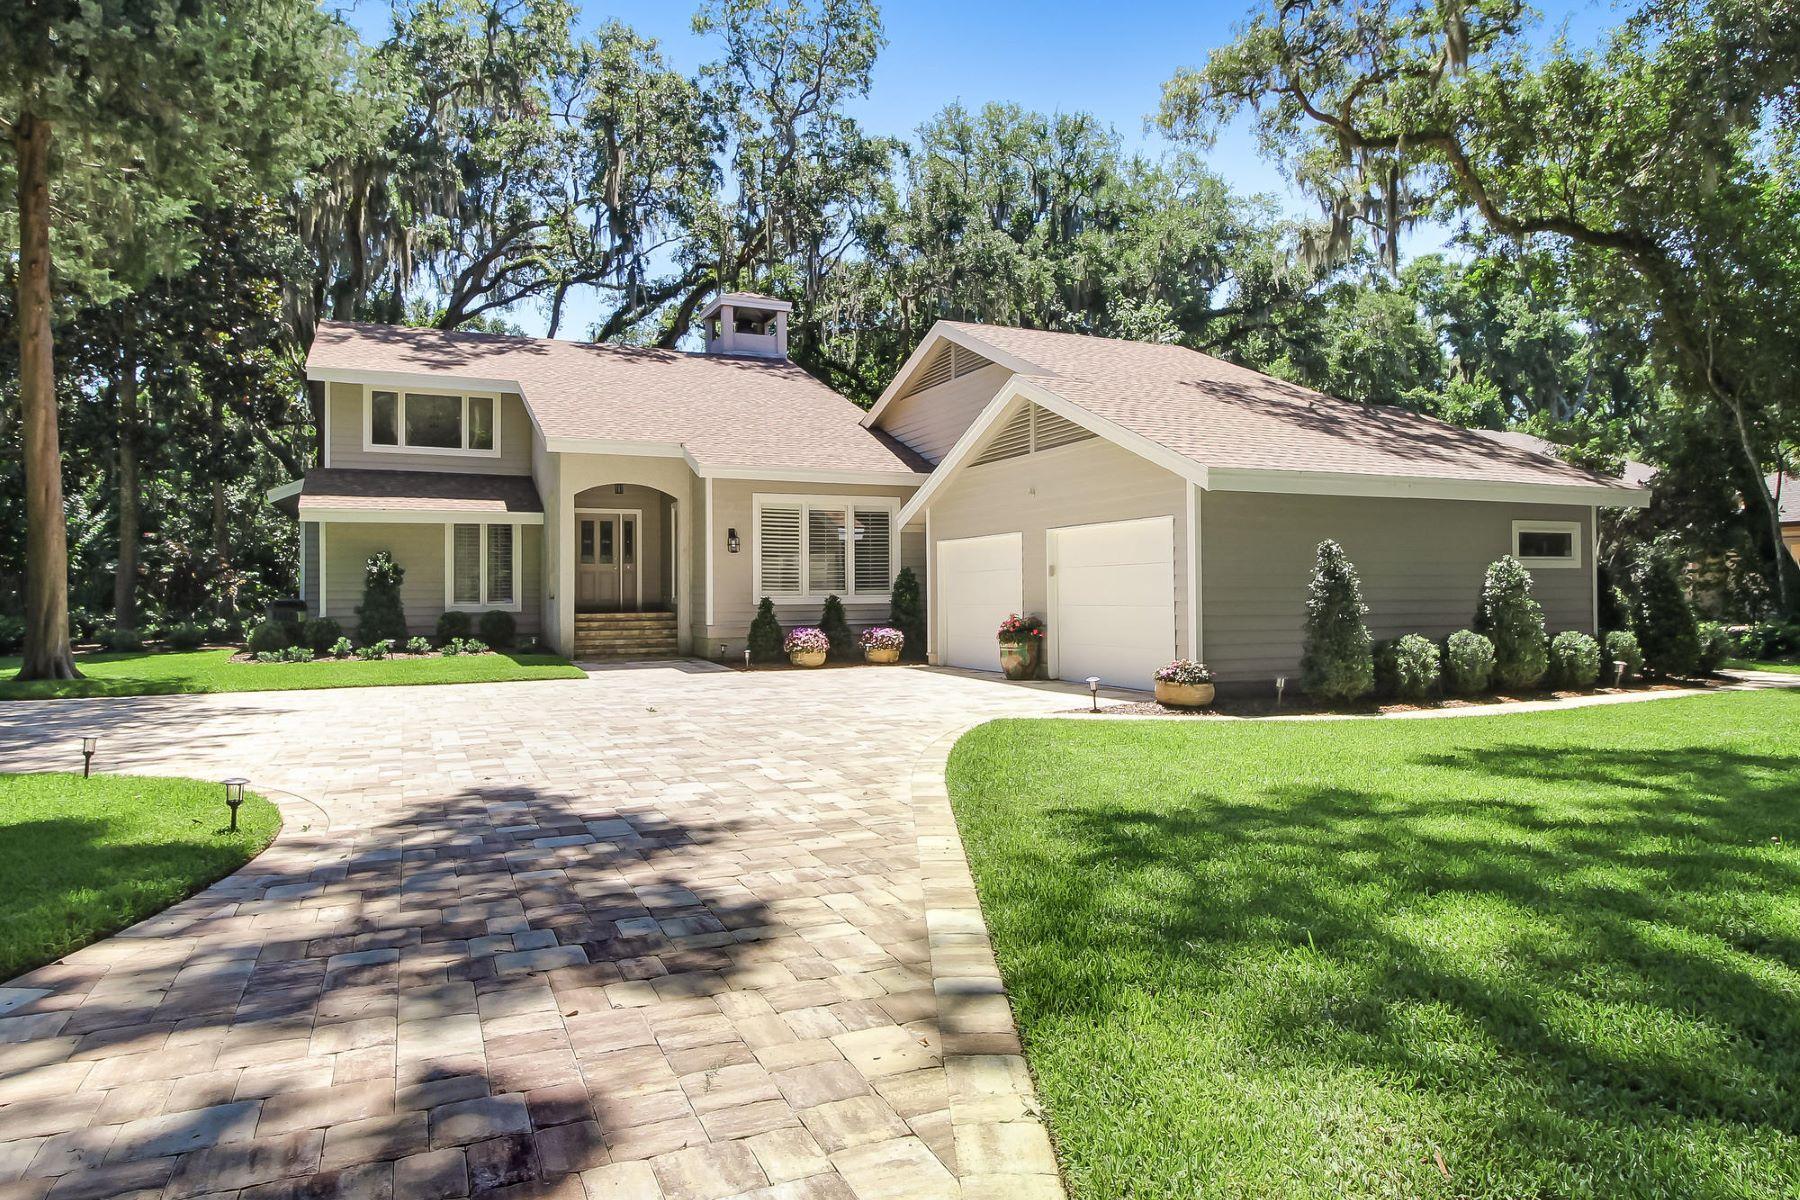 Single Family Homes für Verkauf beim 111 Sea Marsh Rd 111 Sea Marsh Road, Fernandina Beach, Florida 32034 Vereinigte Staaten